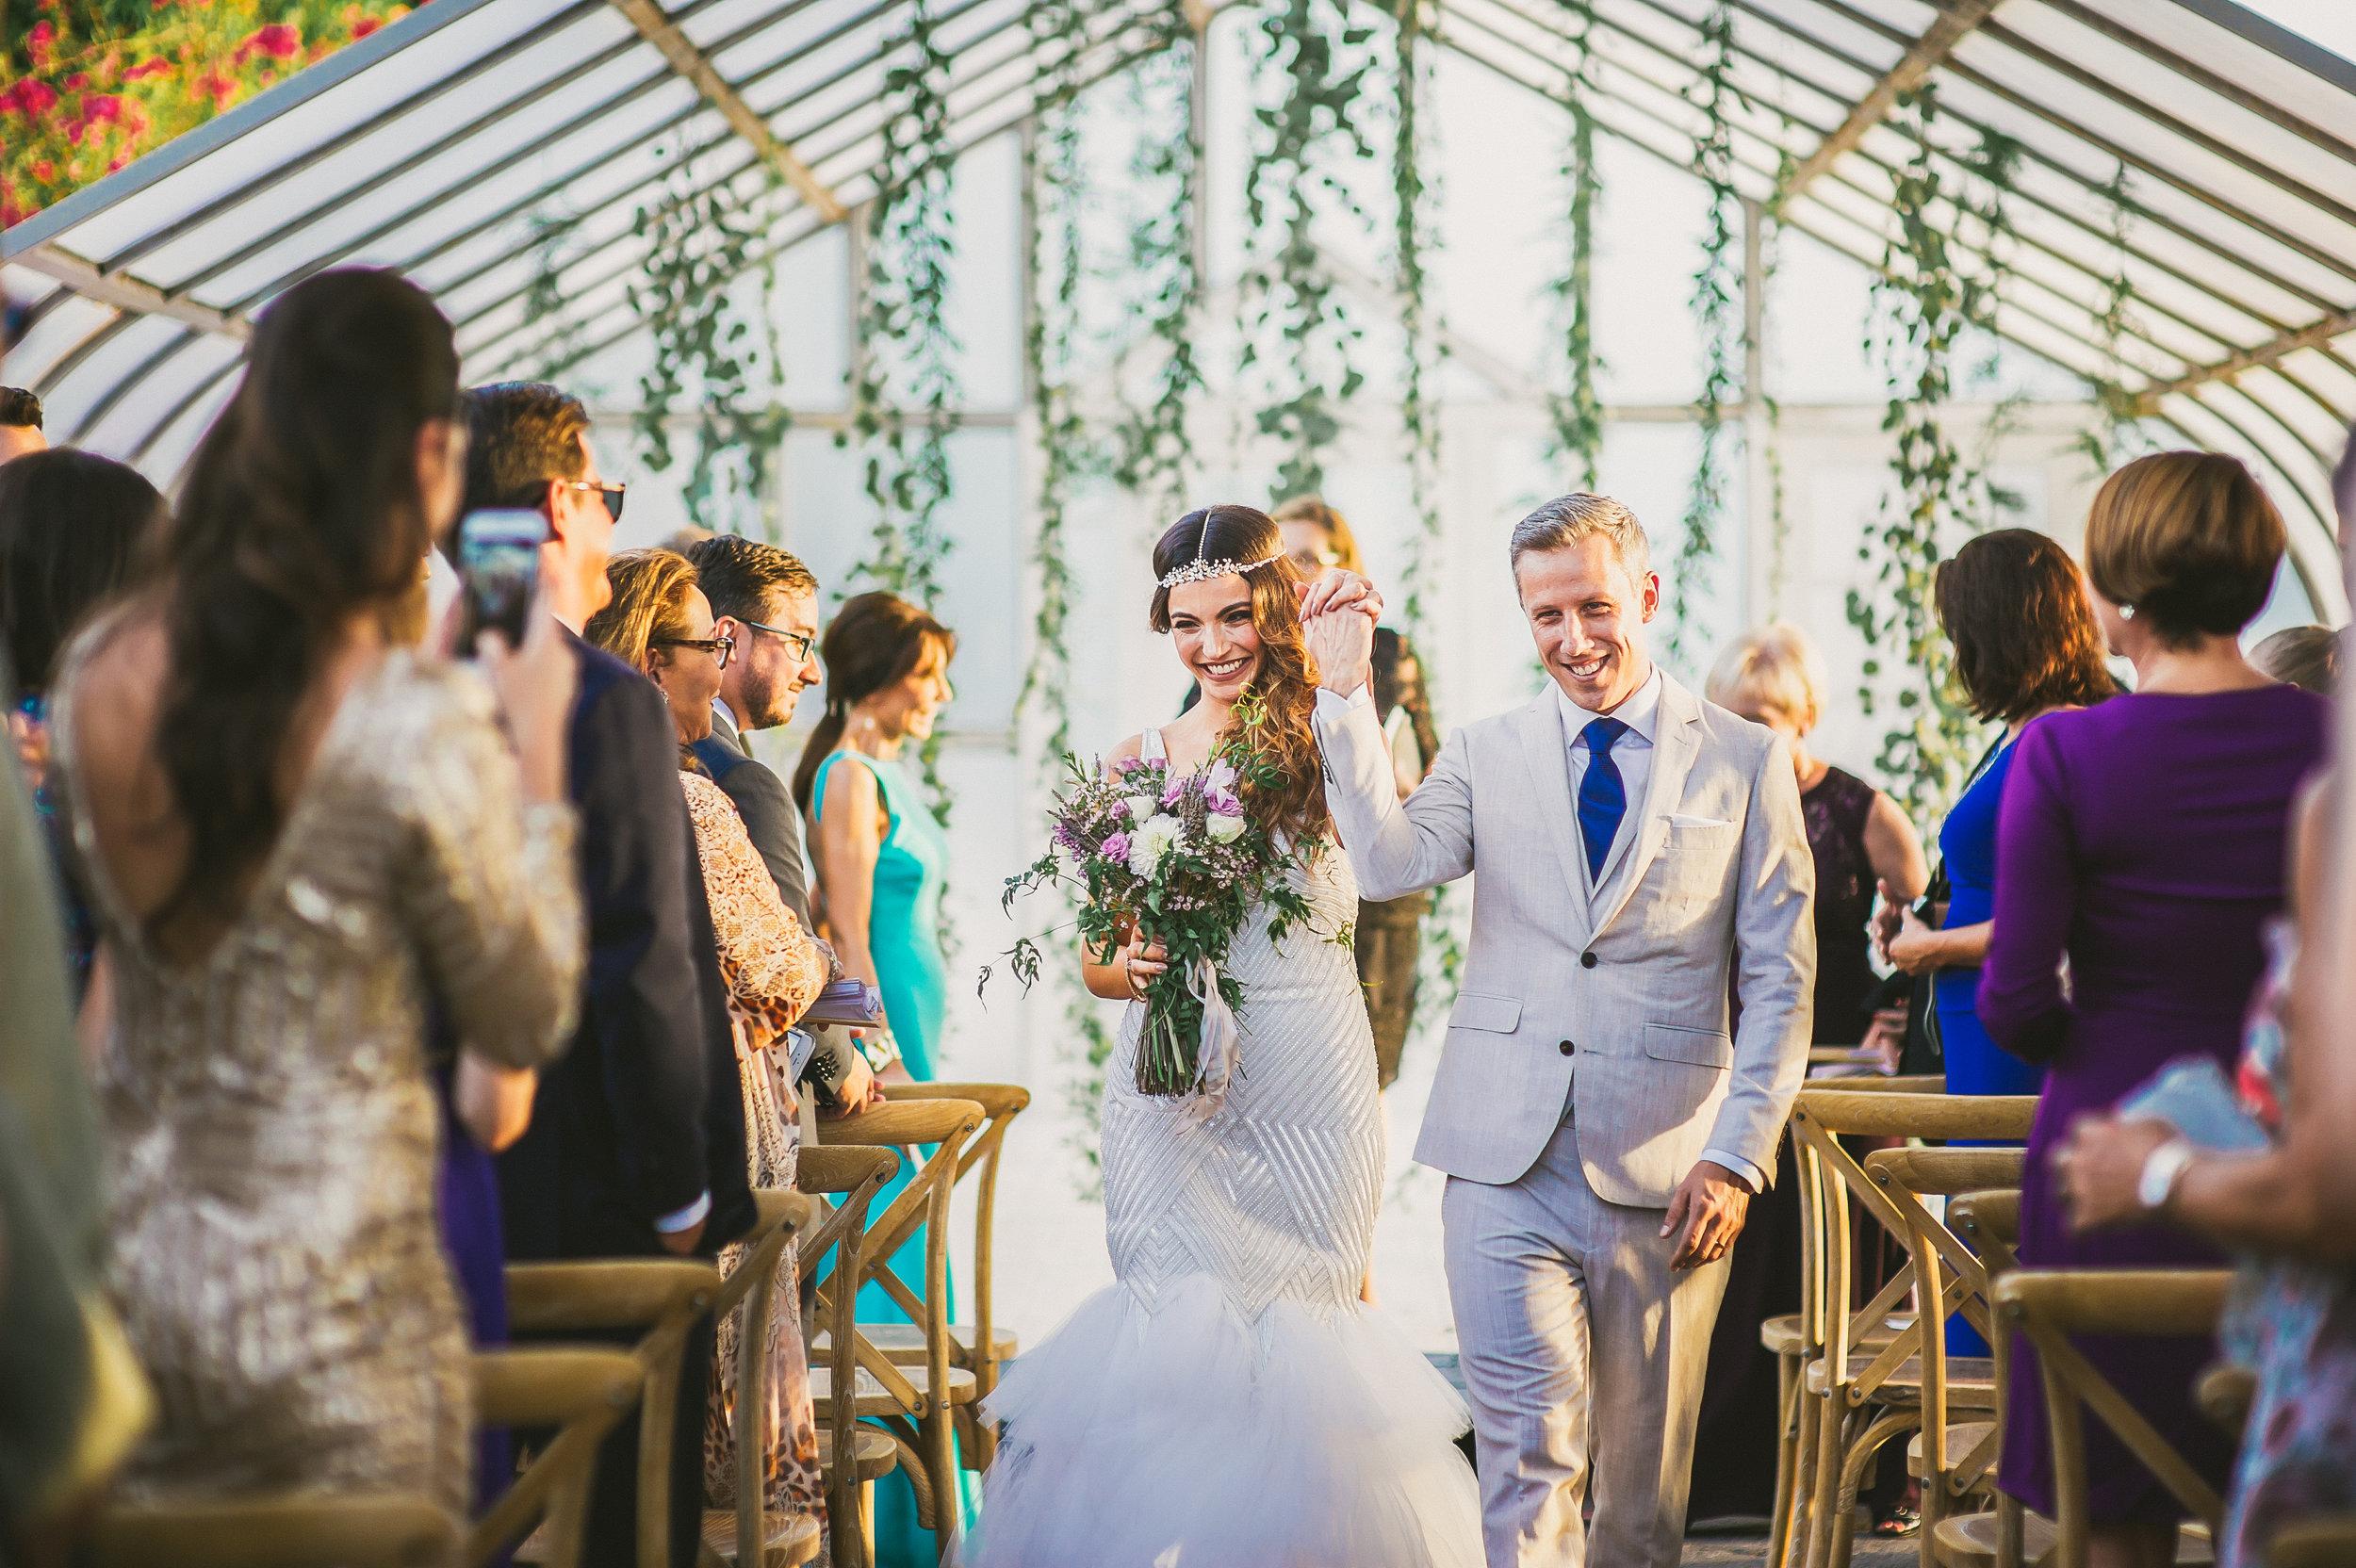 south florida wedding photographer little river studios wedding miami wedding photography art wedding fort lauderdale wedding photographer 34.jpg